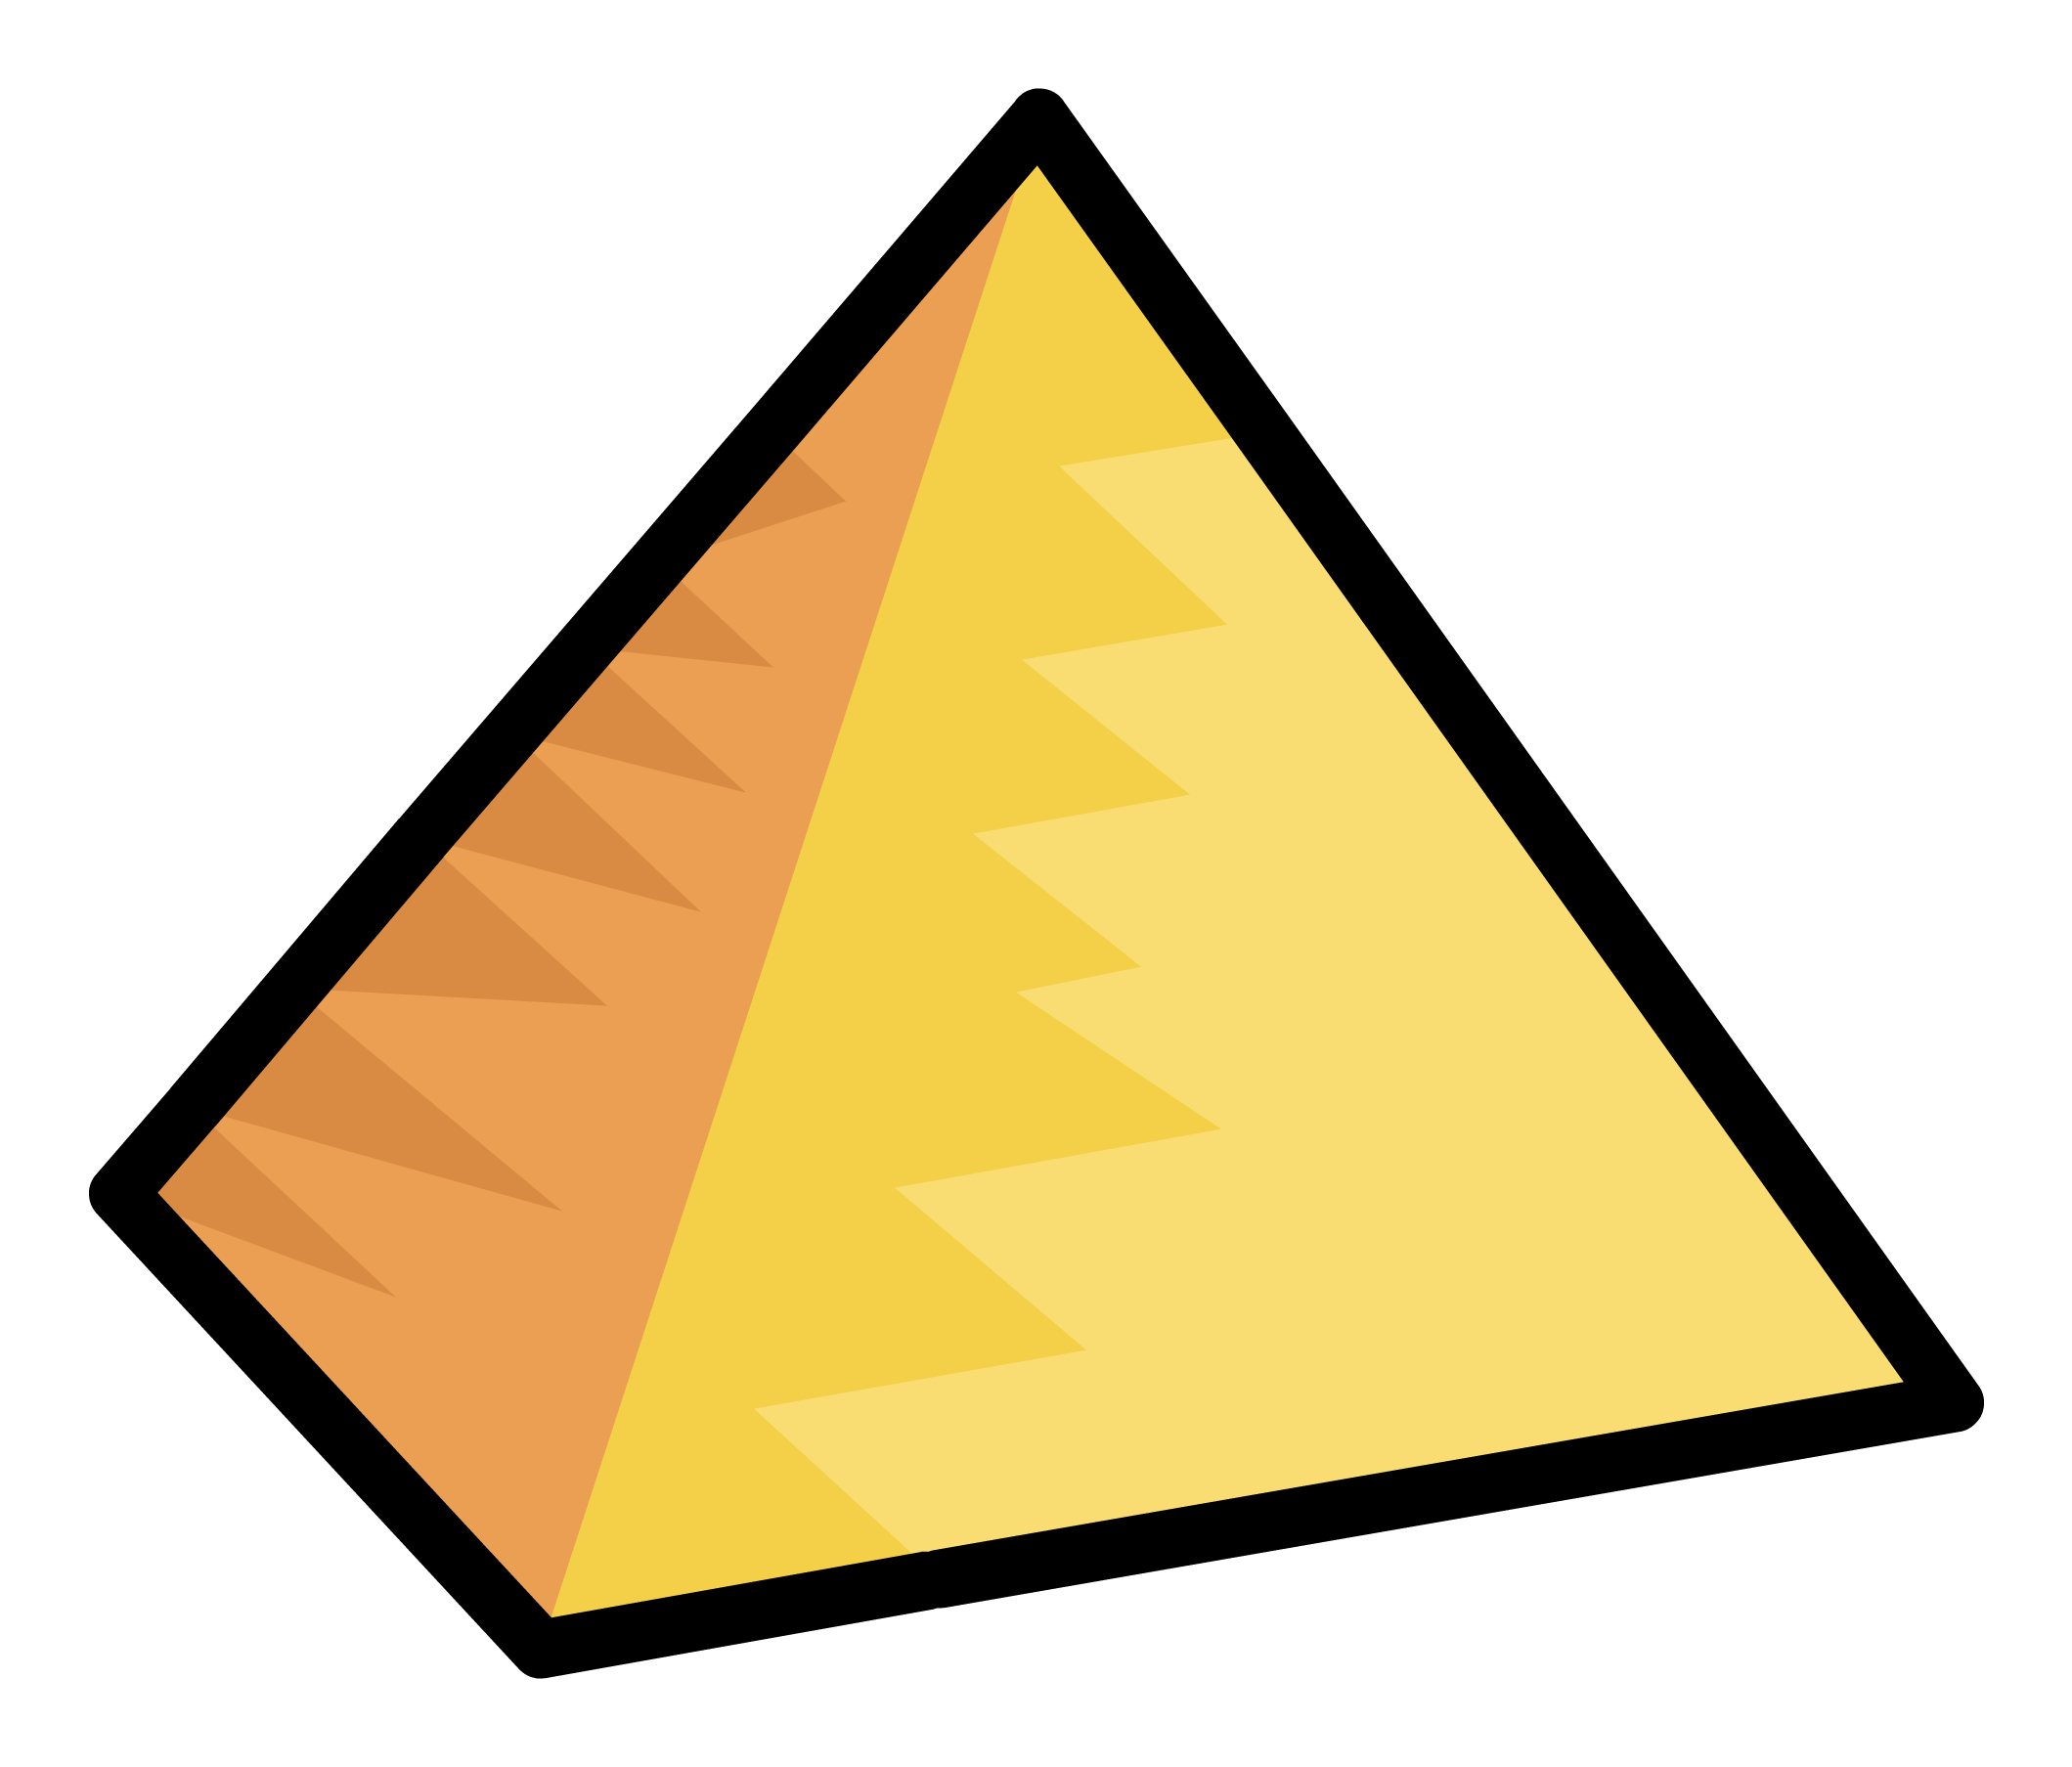 Egyptian pyramids Club Penguin The pyramid principle.